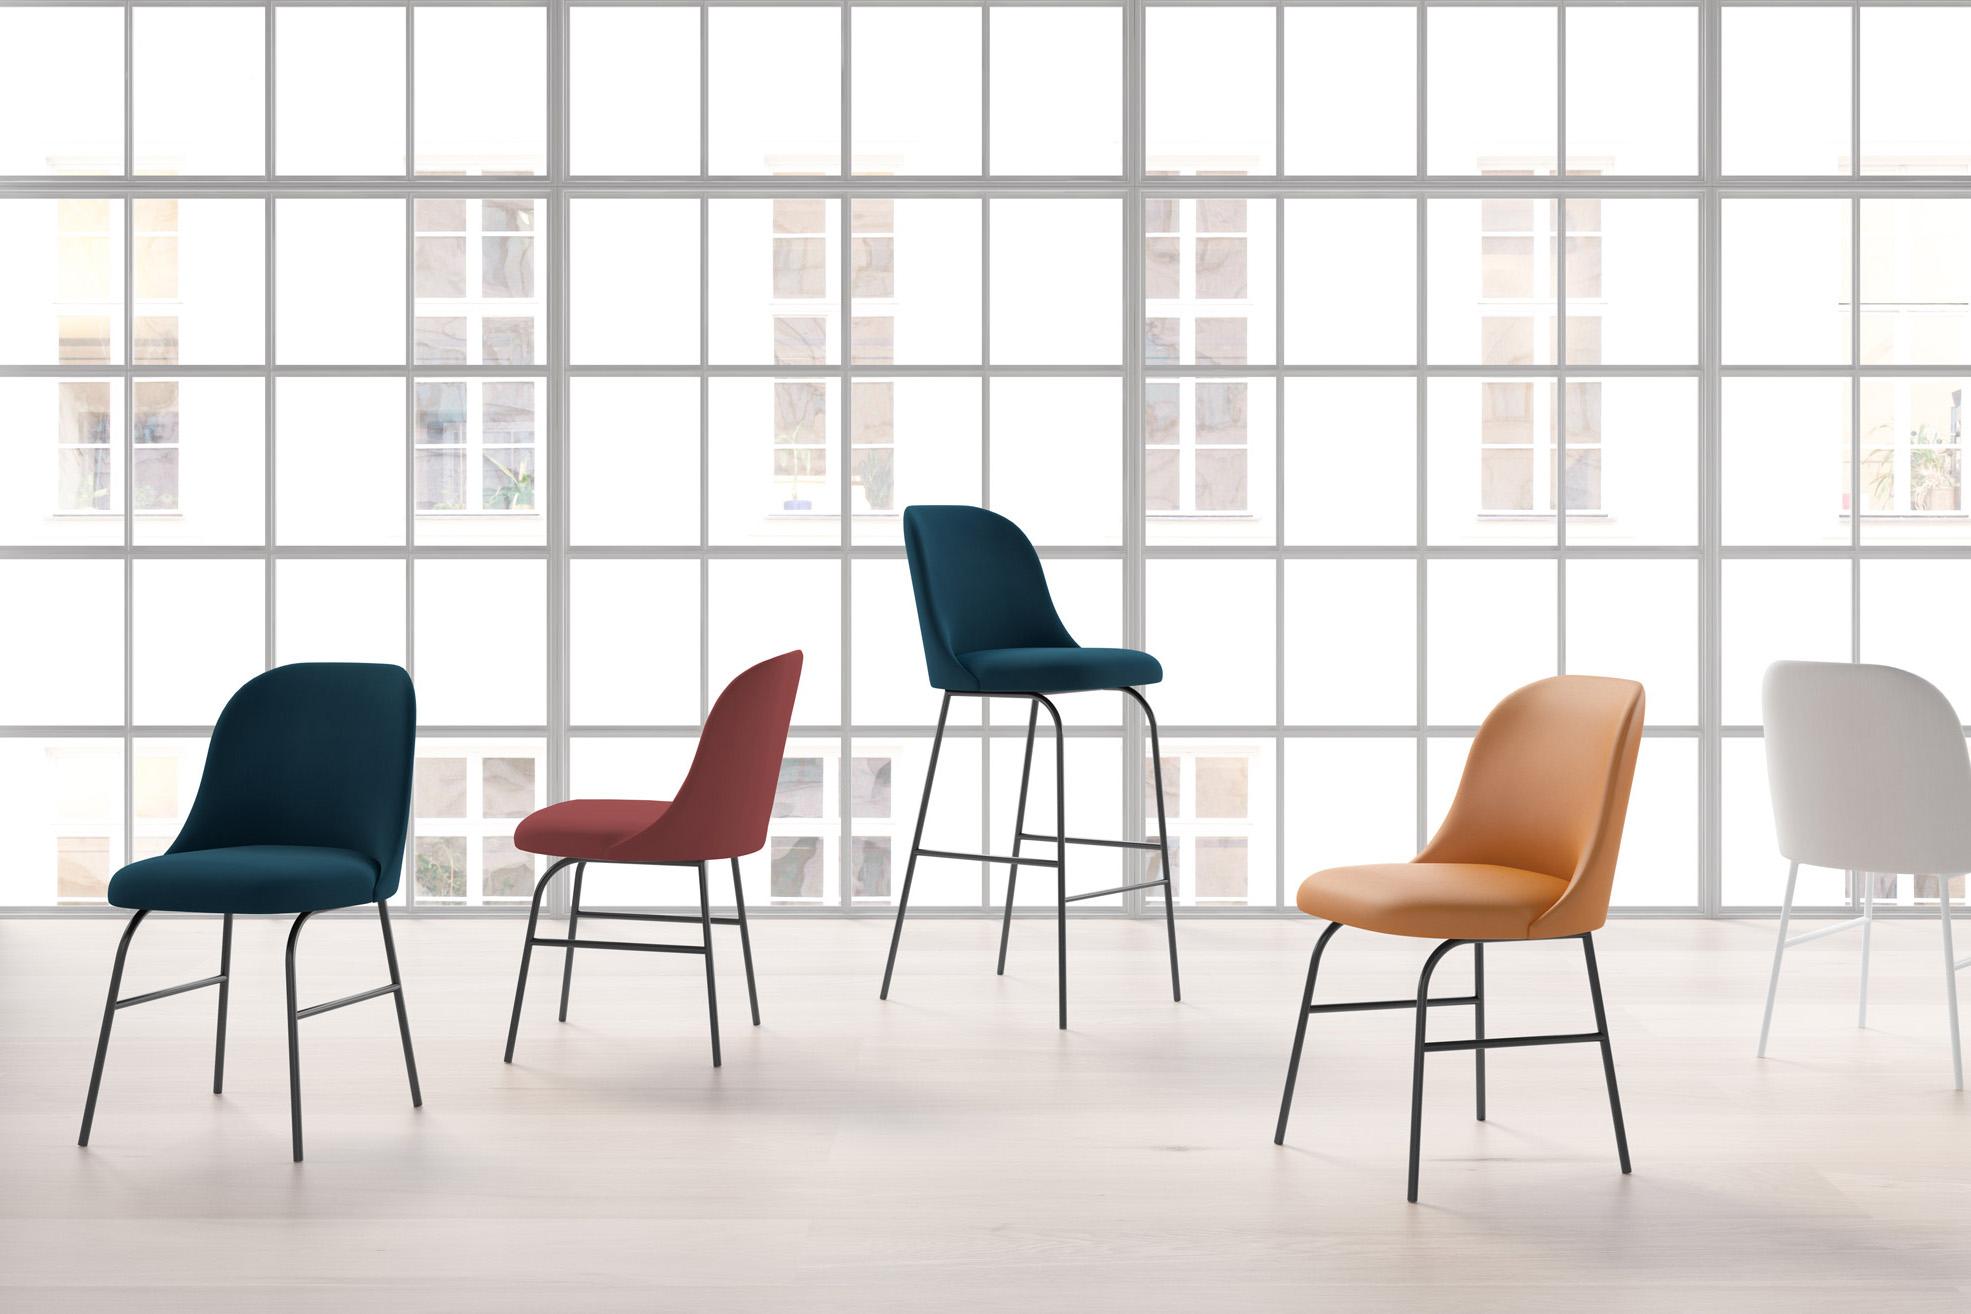 viccabe-aleta-jaime-hayon-design-furniture-chairs_dezeen_2364_col_14.jpg